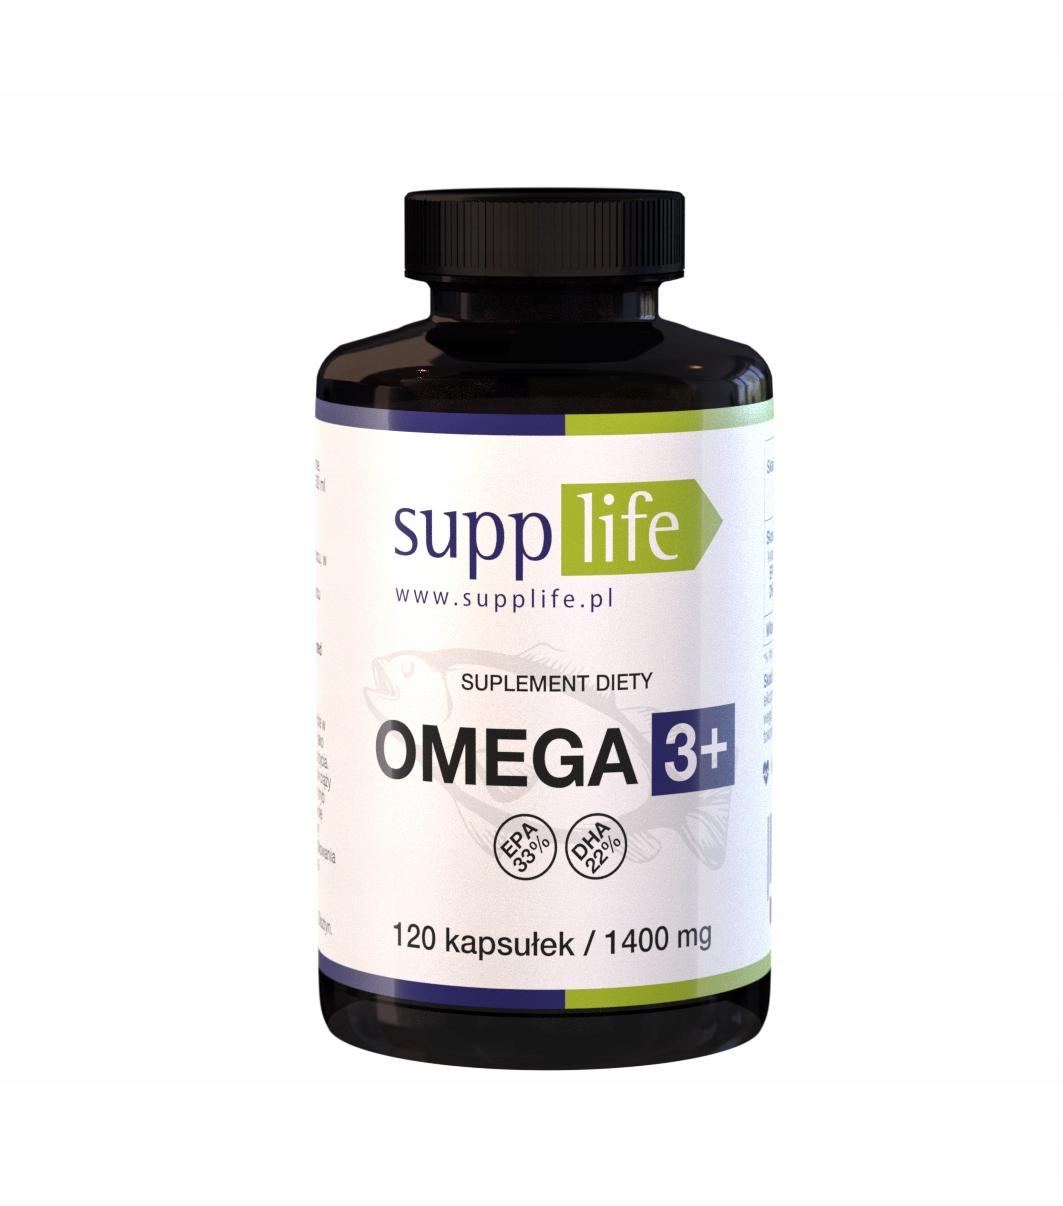 Supplife Omega 3+ 120 kaps OMEGA-3 EPA DHA